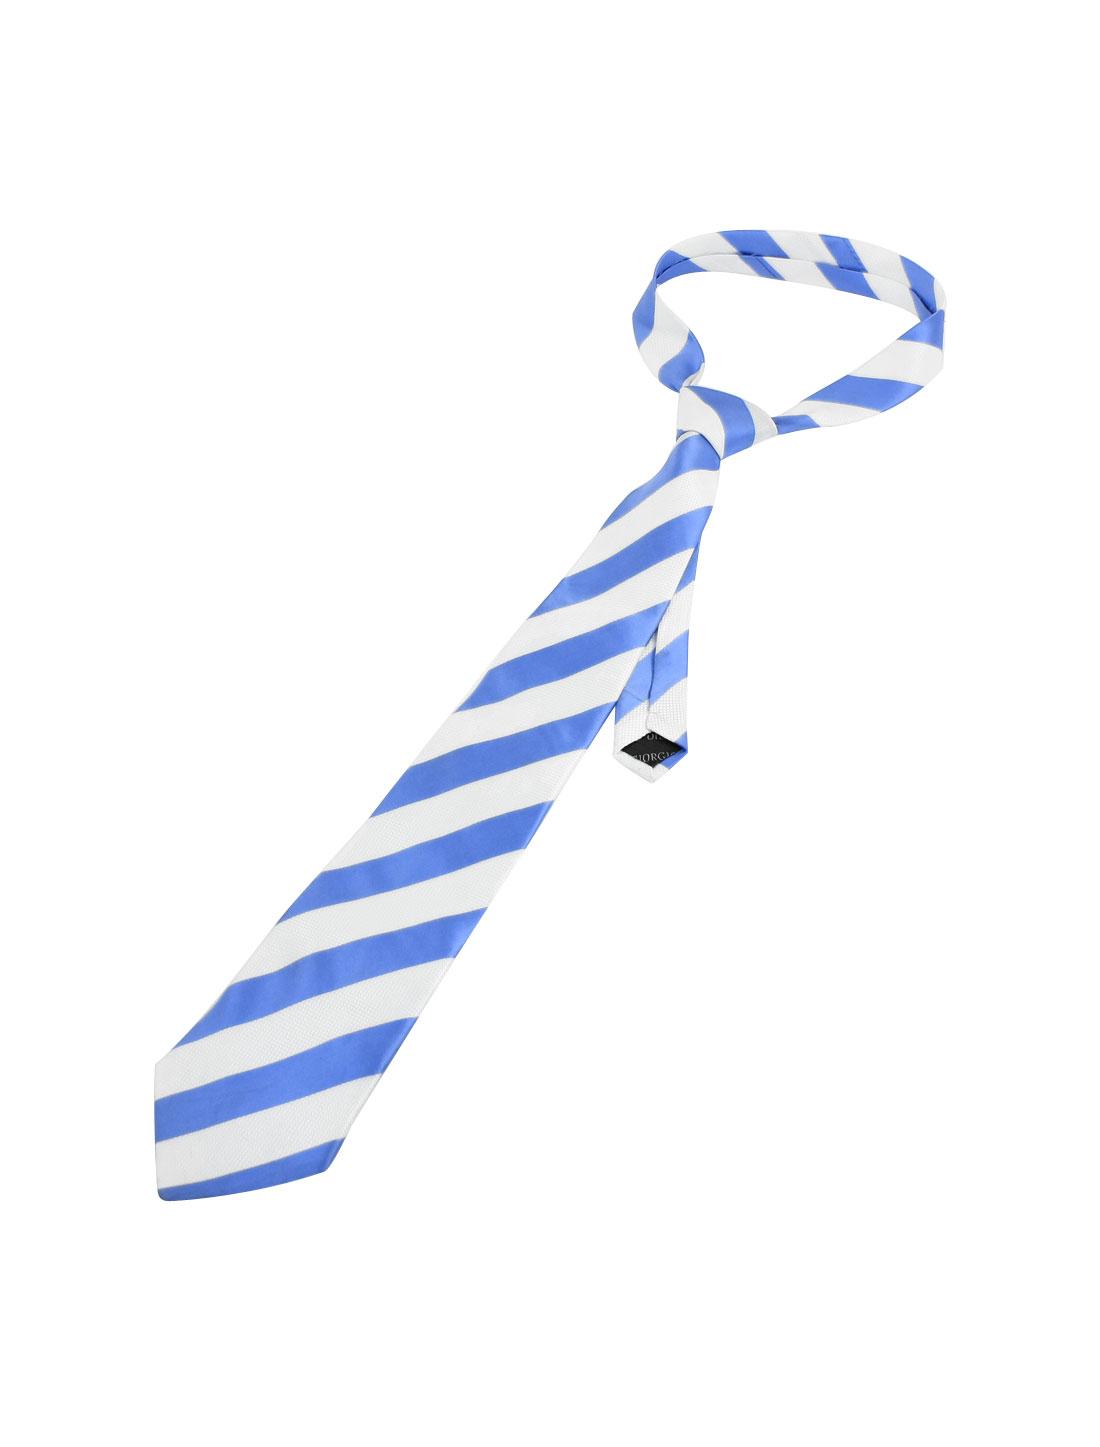 "Men 3 7/8"" Width Stripes Style Self Tie Neckwear Necktie Blue White"